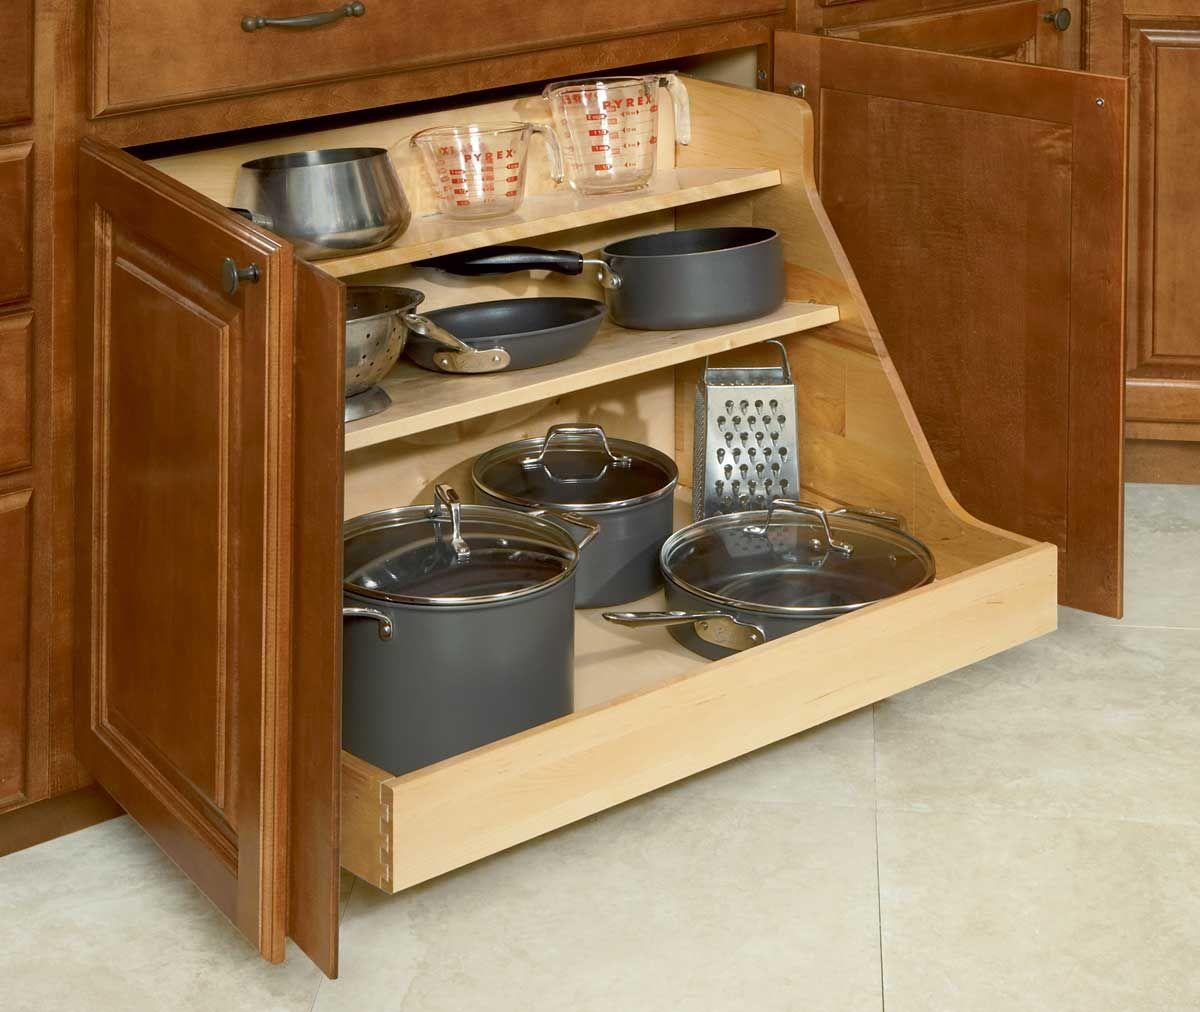 Storage Cabinet For Kitchen: Pot And Pan Organizer